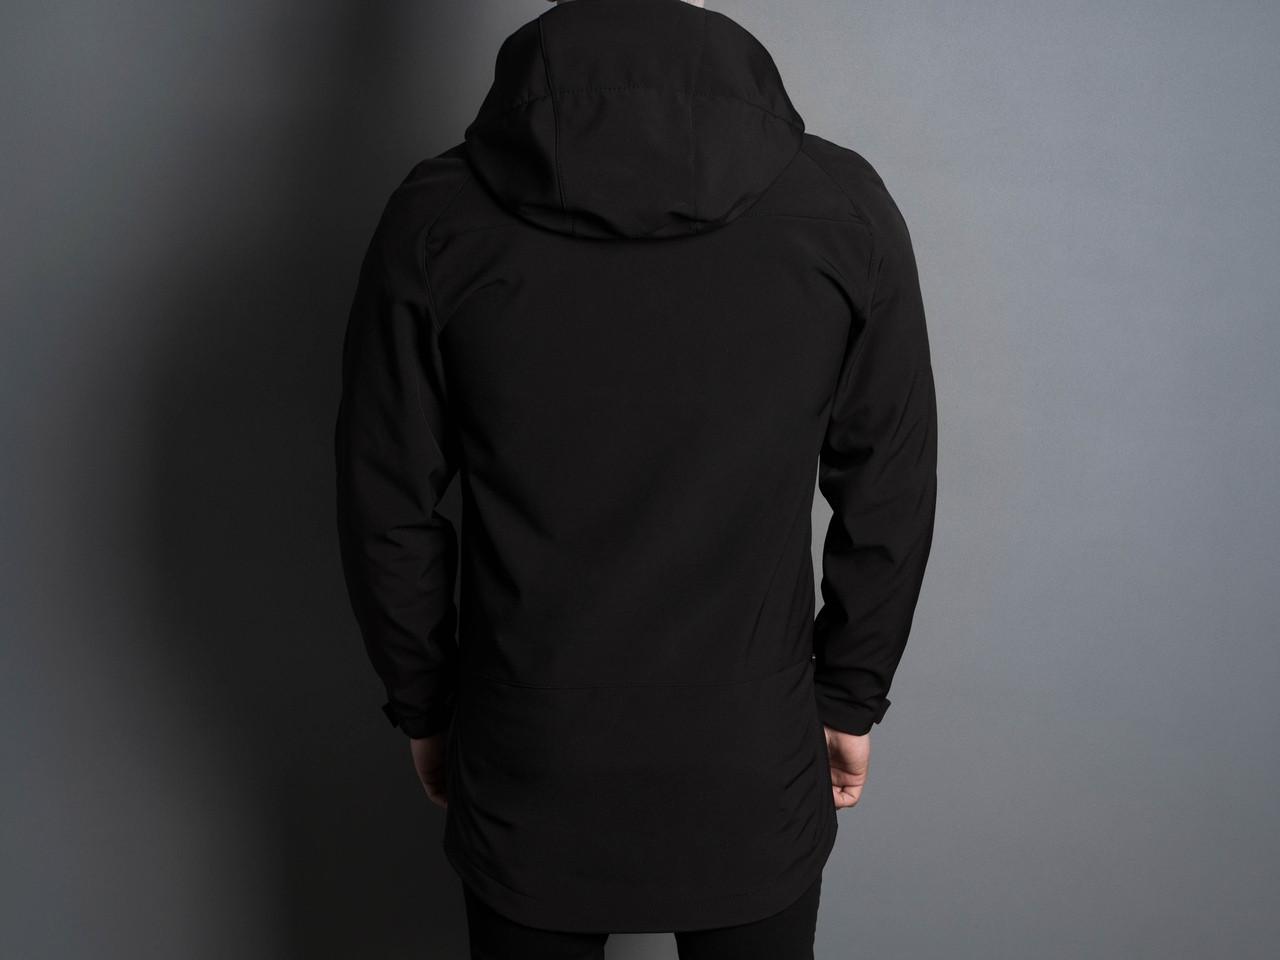 Мужская куртка Darkness Pobedov (черная)